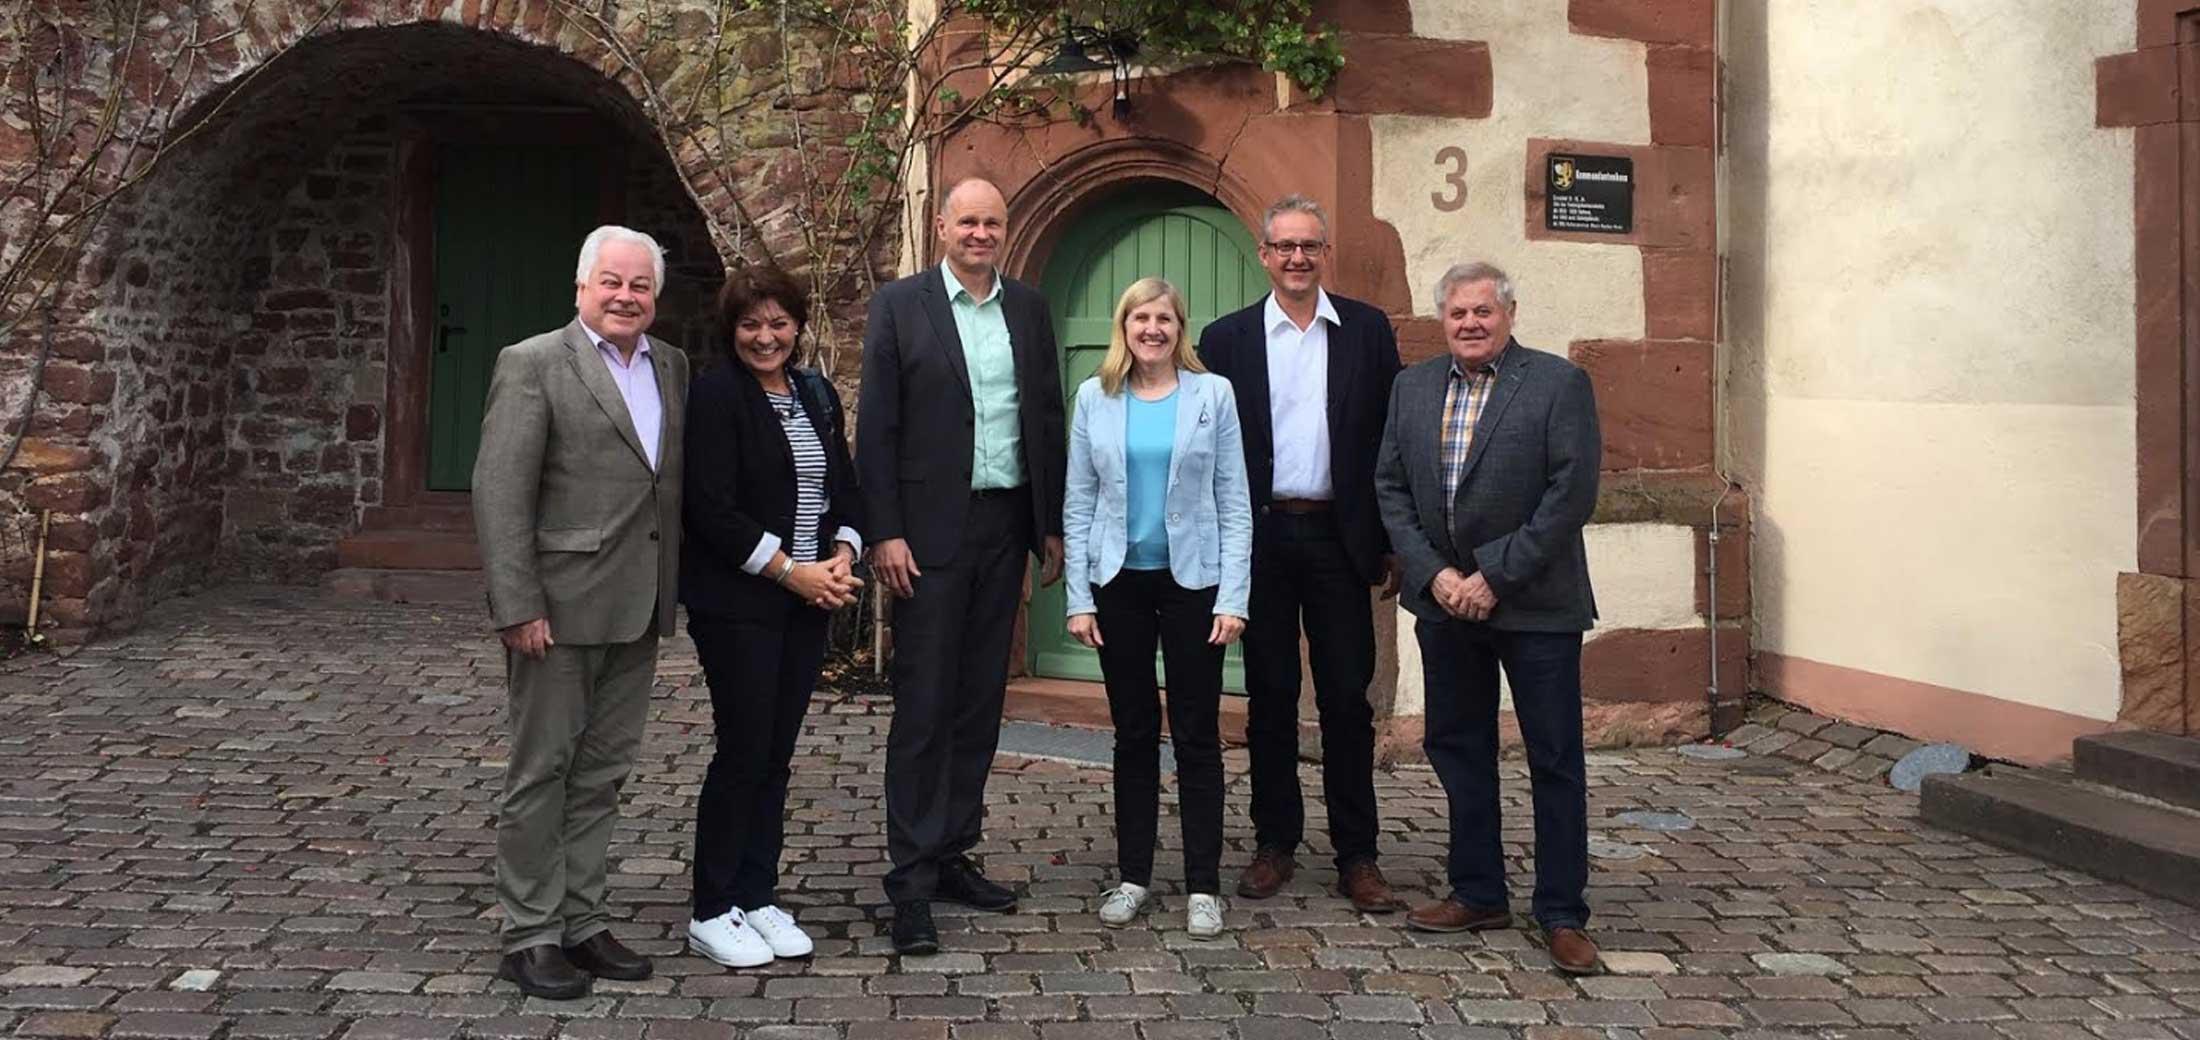 FDP-Fraktion vor Ort: Kultur im Landkreis